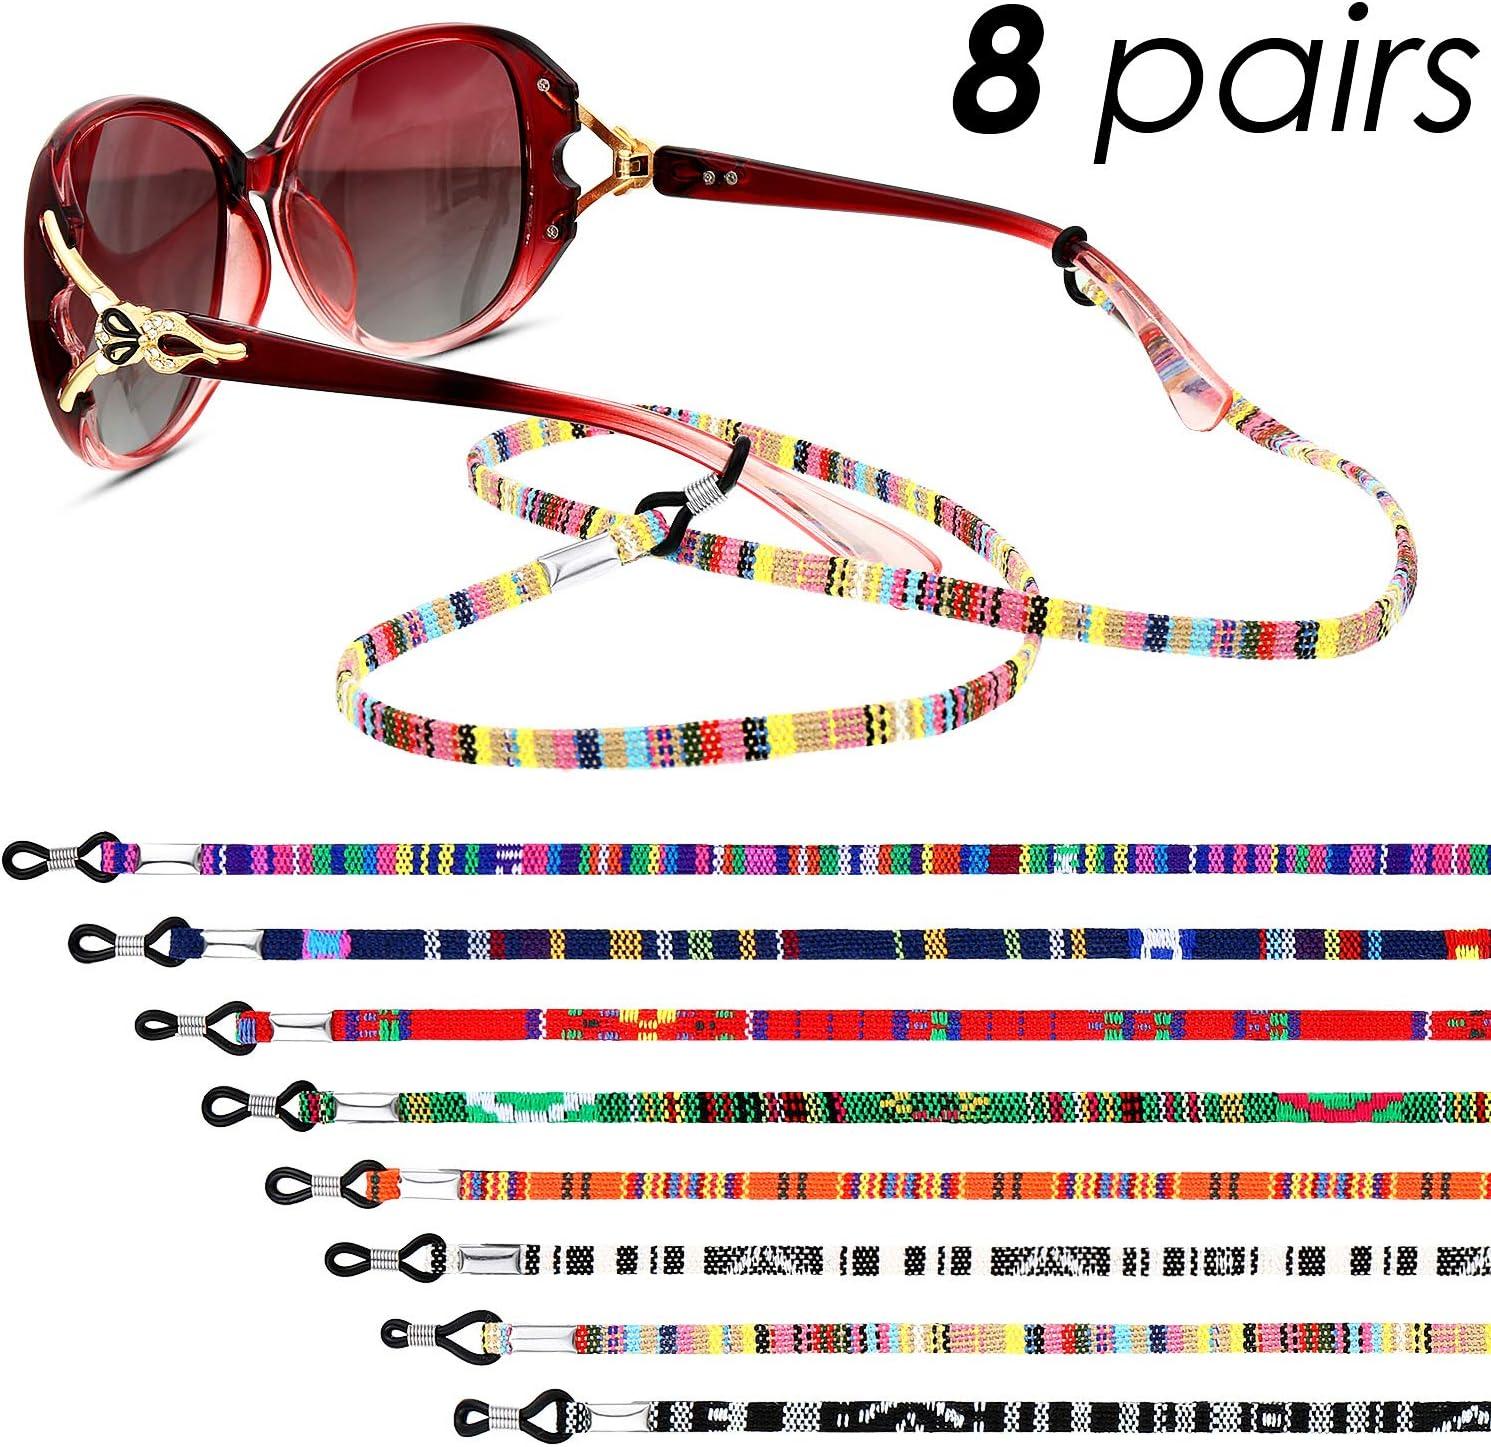 8 Pieces Eyeglass Holder Strap Eyeglass Chain Eyeglass Cord Lanyard for Women Men